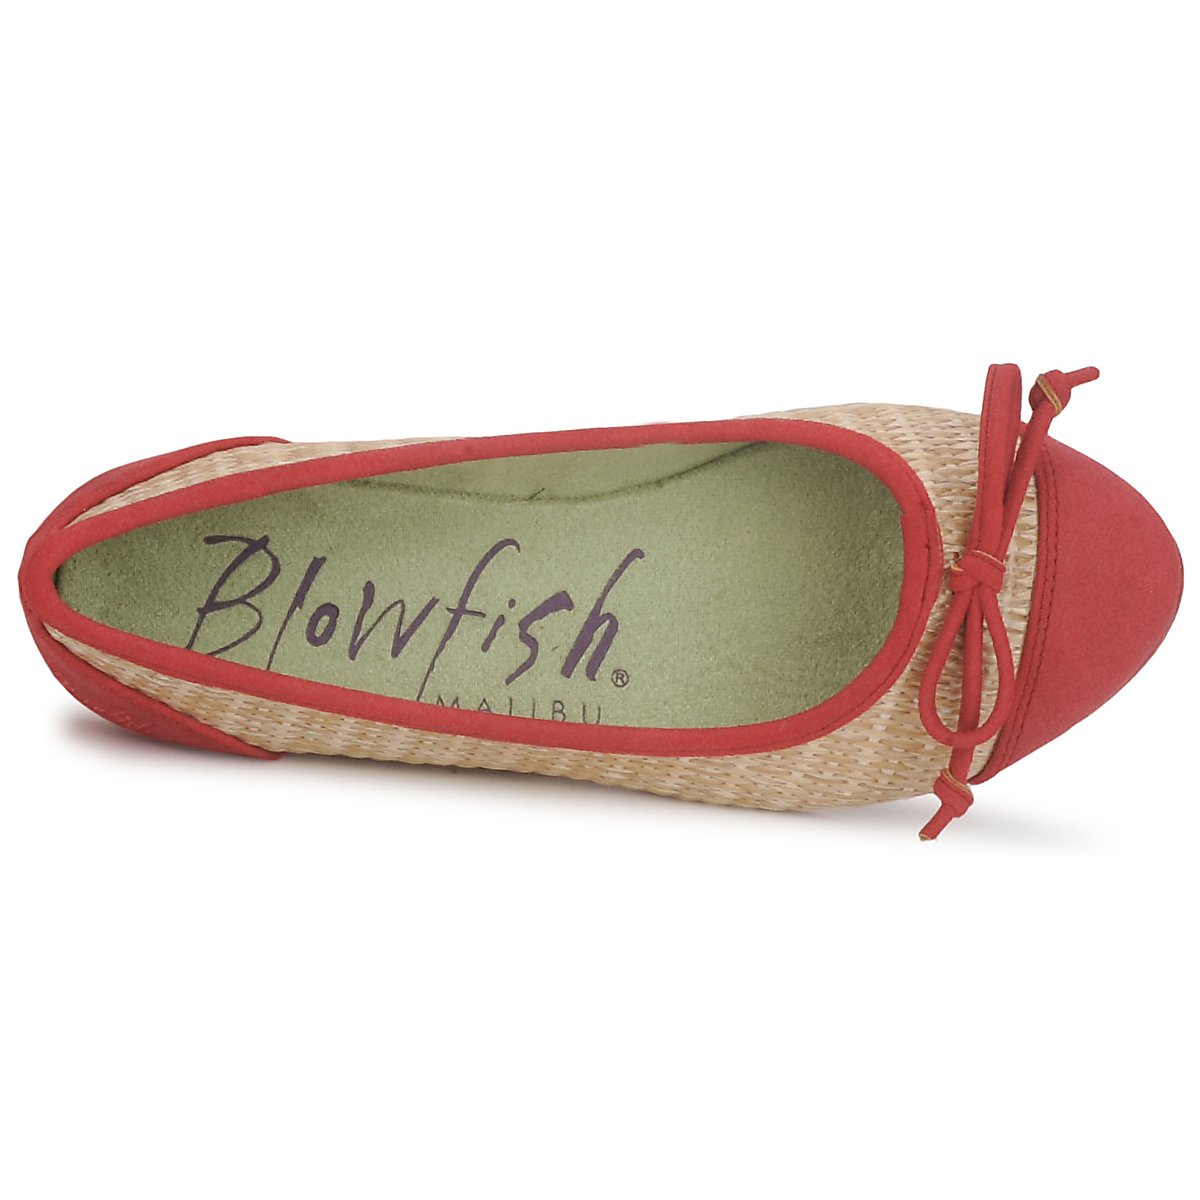 Blowfish Blowfish Blowfish Malibu NITA Rojo -  Nueva promoción - Zapatos Bailarinas Mujer 1769ae